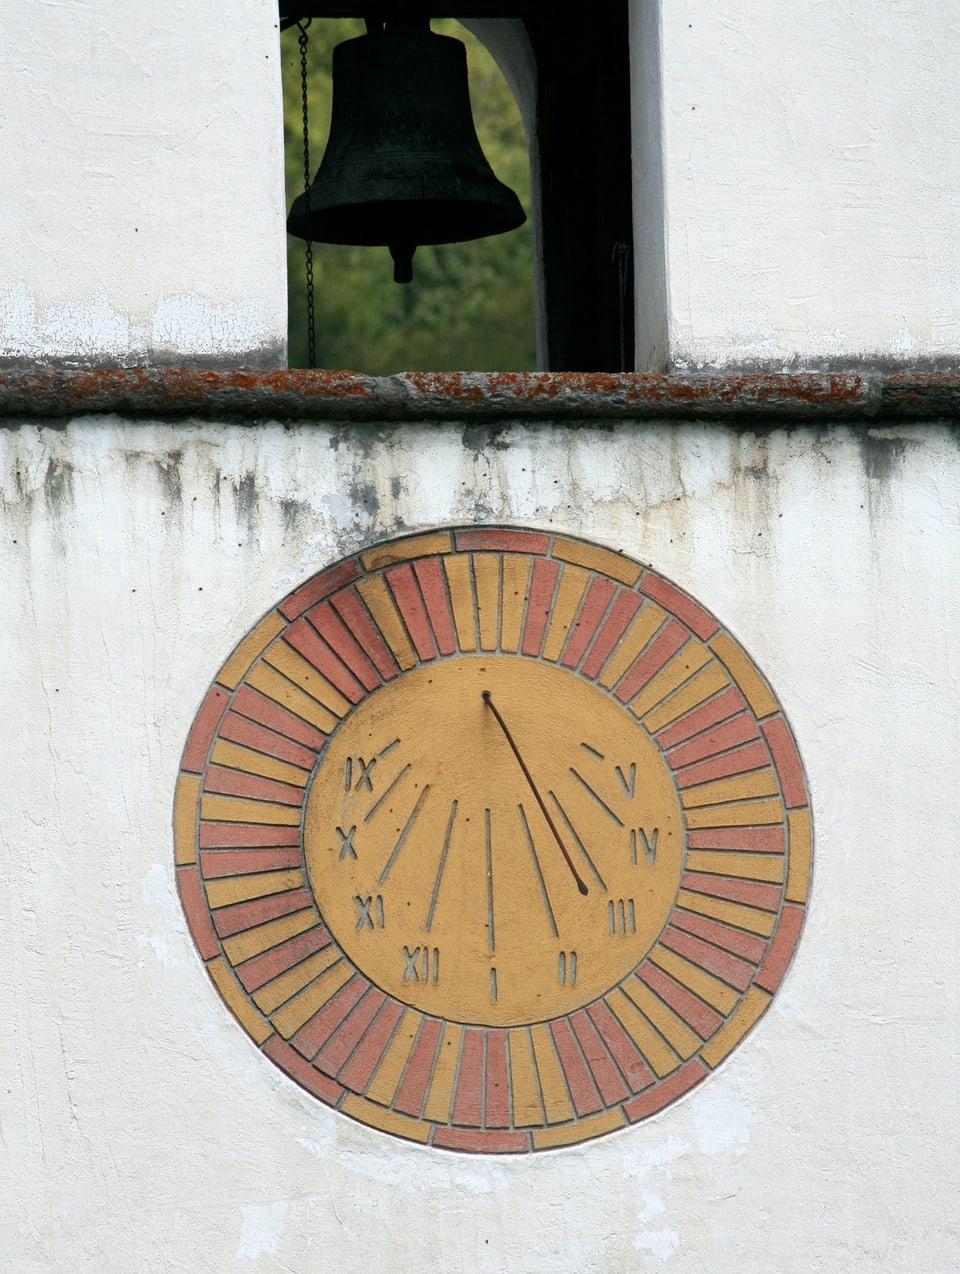 Ura da sulegl sin la baselgia da San Giovanni Nepomuk, Mesocco